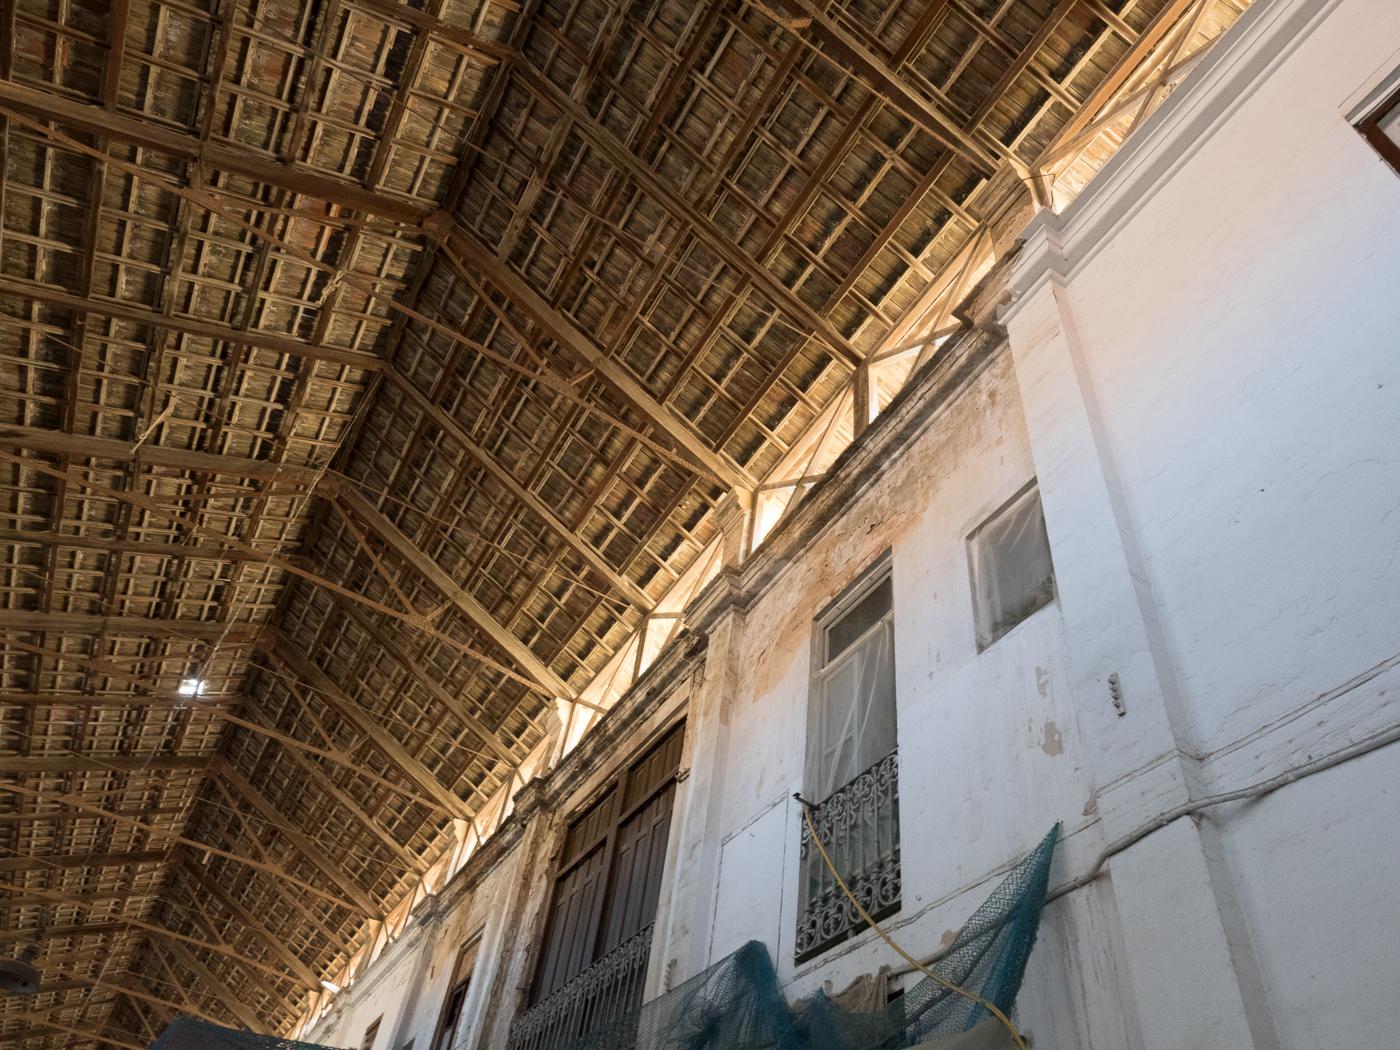 Th amazing inner courtyard roof of La Long de pescado, Cabanyal